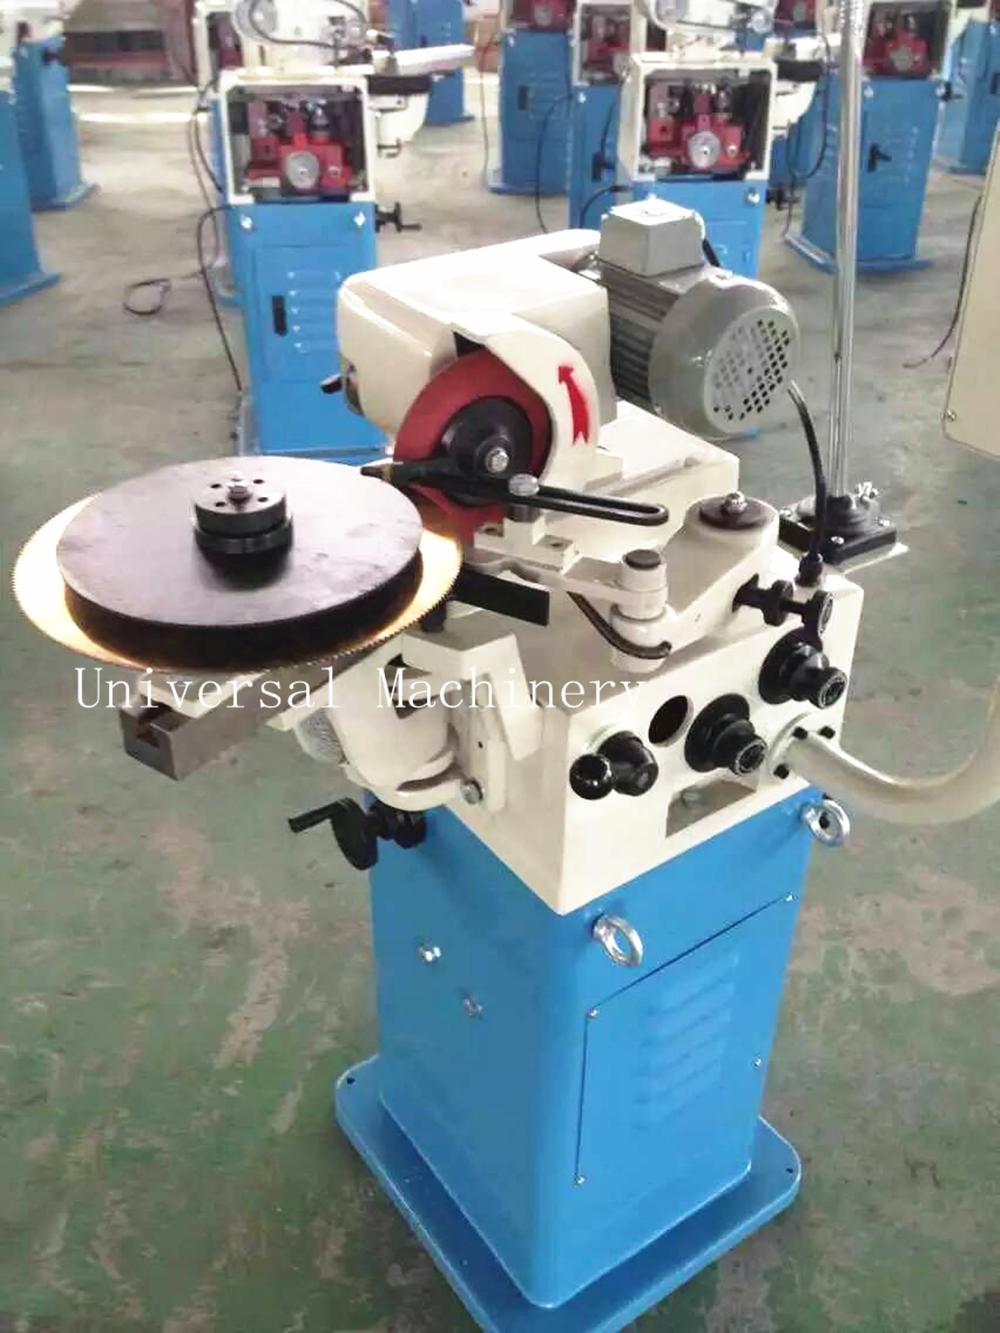 China Manufacturer Low Price Saw Blade Sharpening Machine - Buy Saw Blade  Sharpening Machine,Low Price Blade Tooth Making And Shaping Machine,Blade